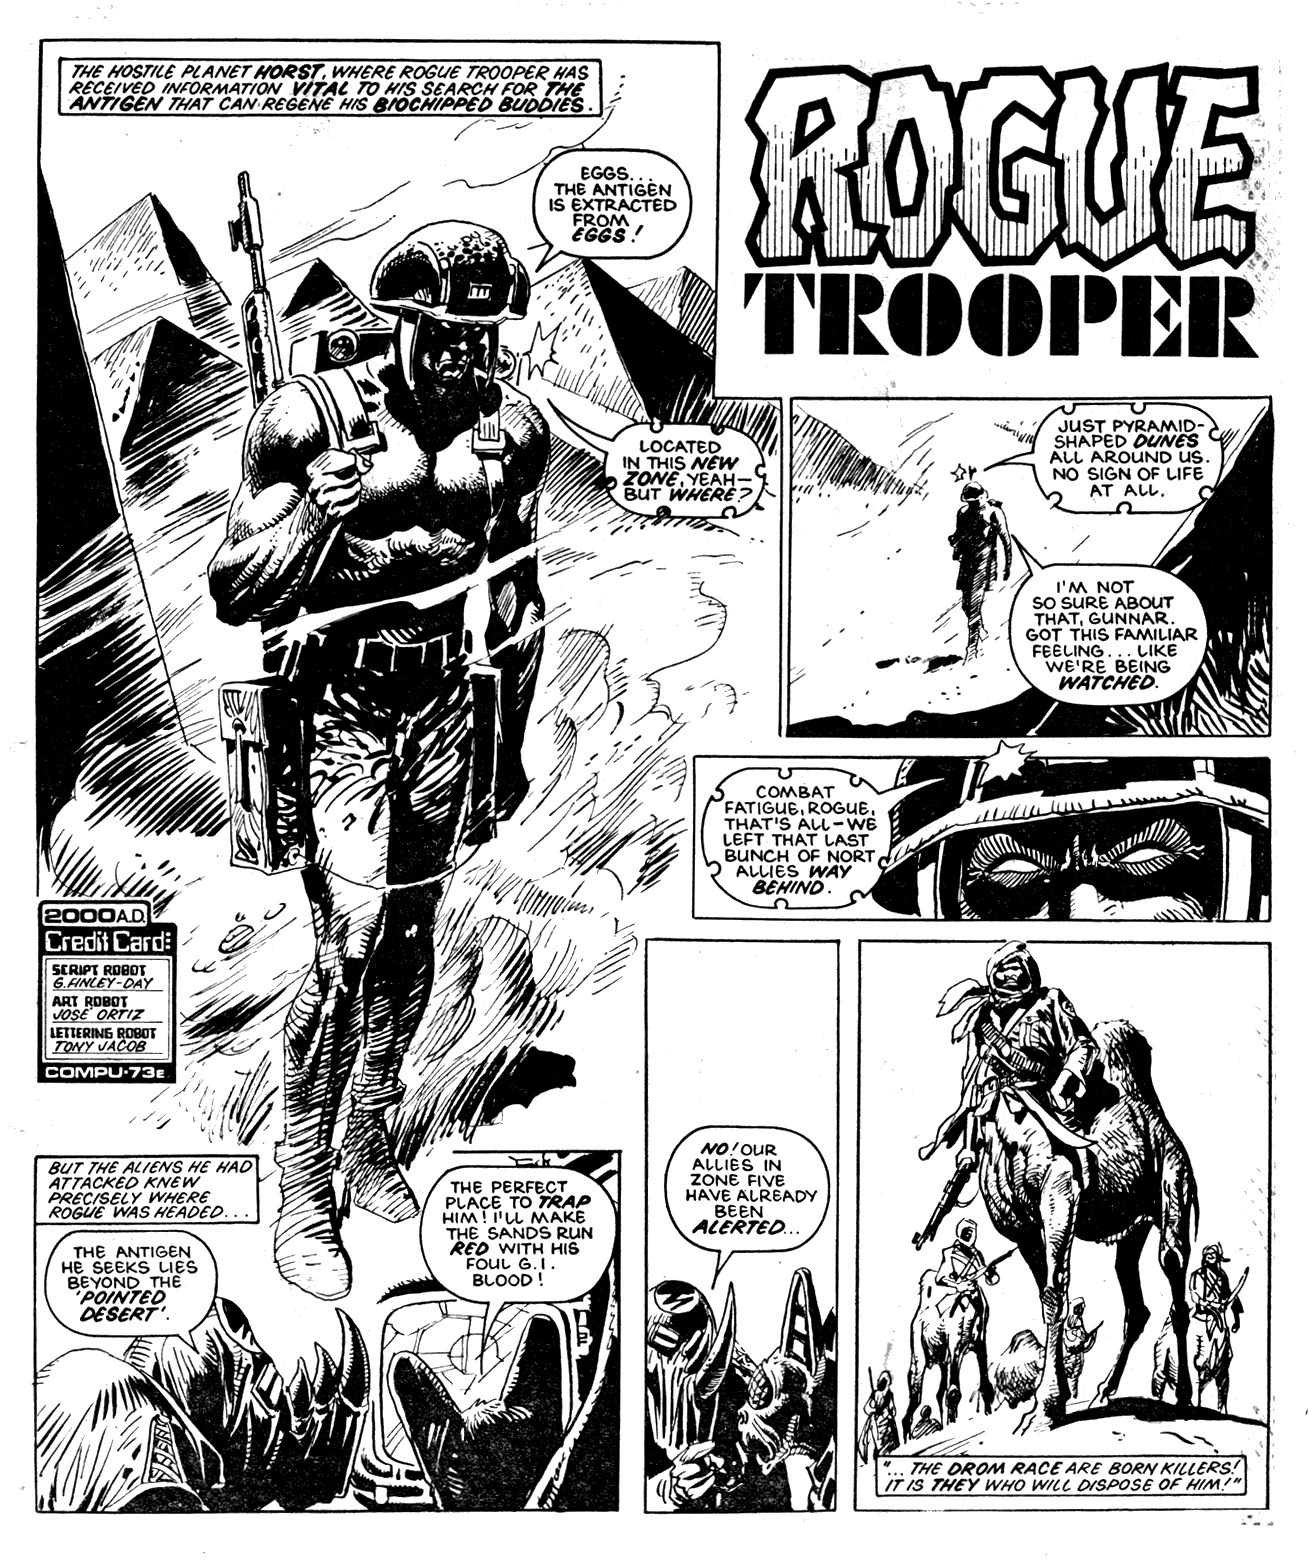 jose ortiz Comics, Trooper, 2000ad